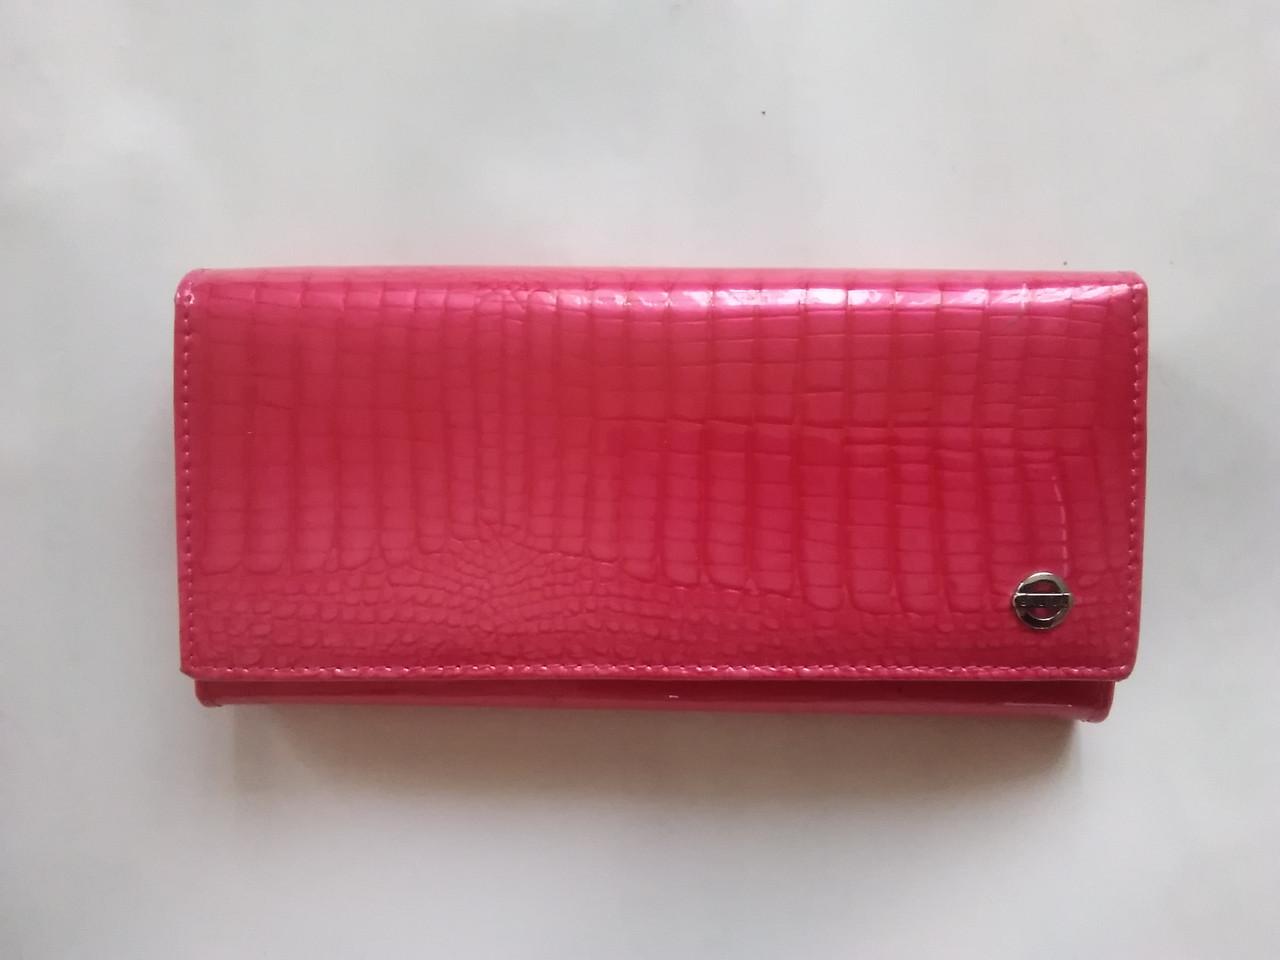 d06ea355a5e5 Кошелек женский кожаный Balisa (классика) - Интернет-магазин